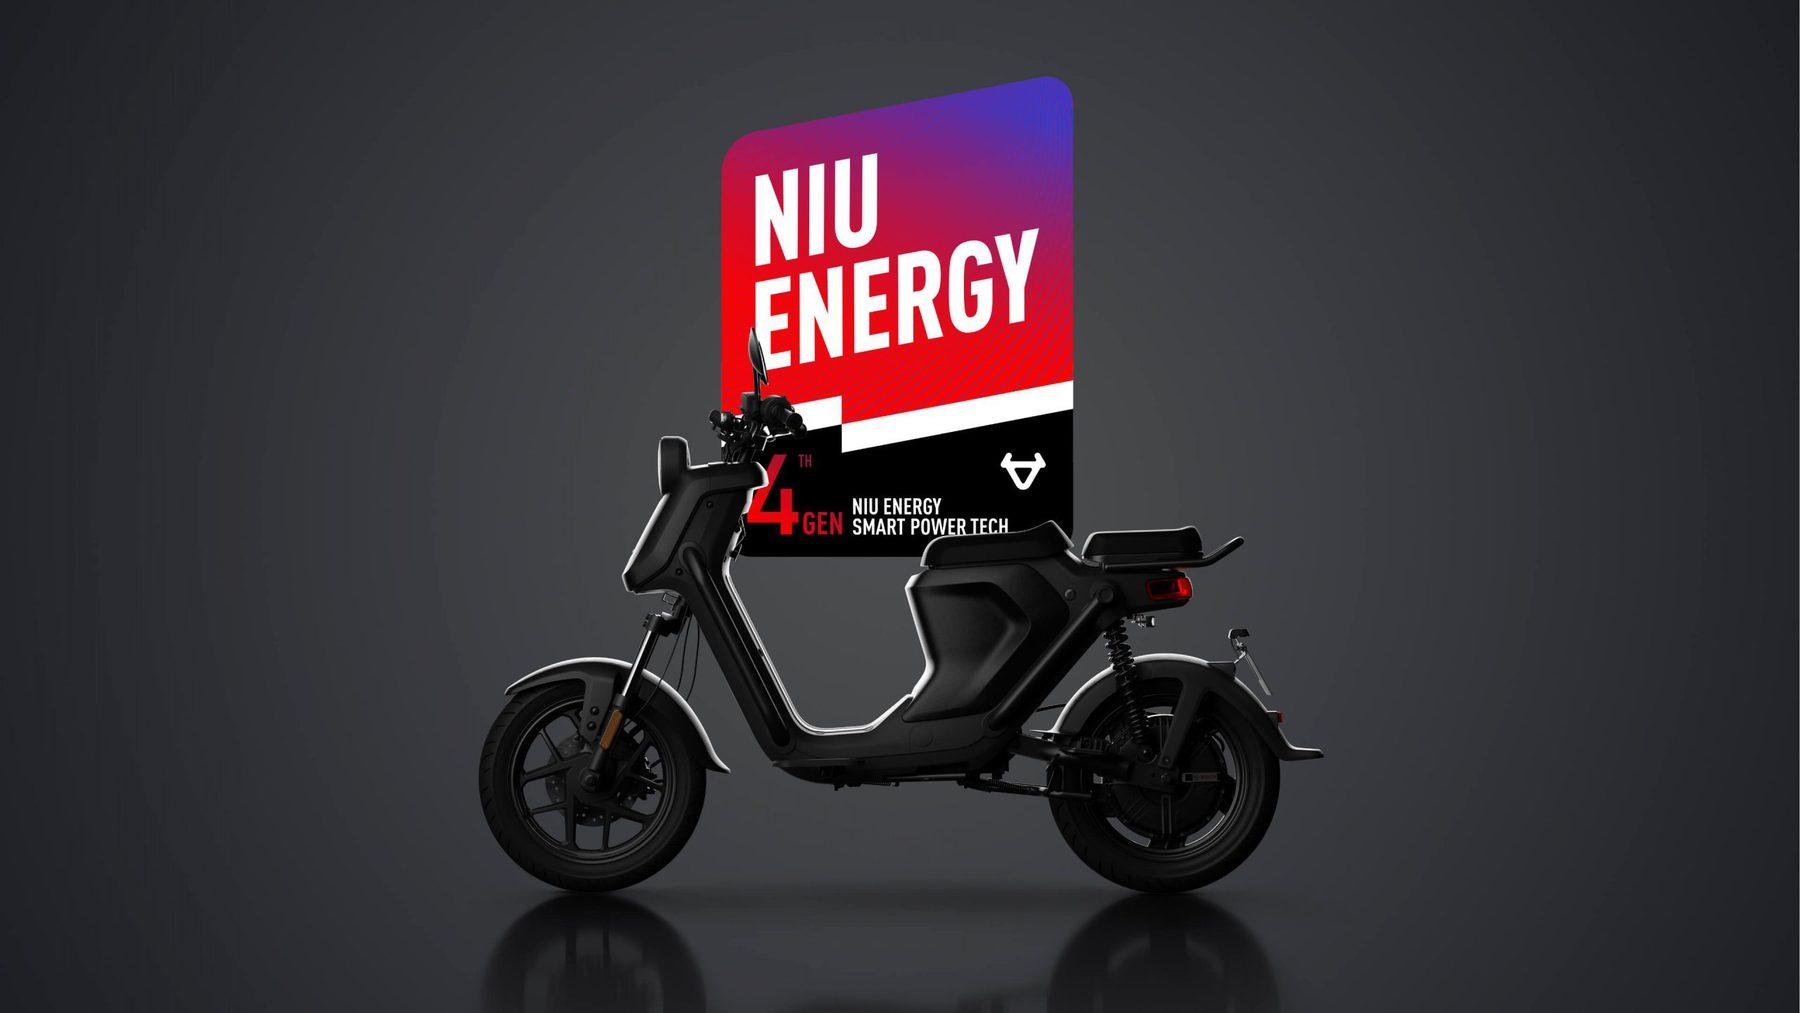 niu scooter 4th gen energy